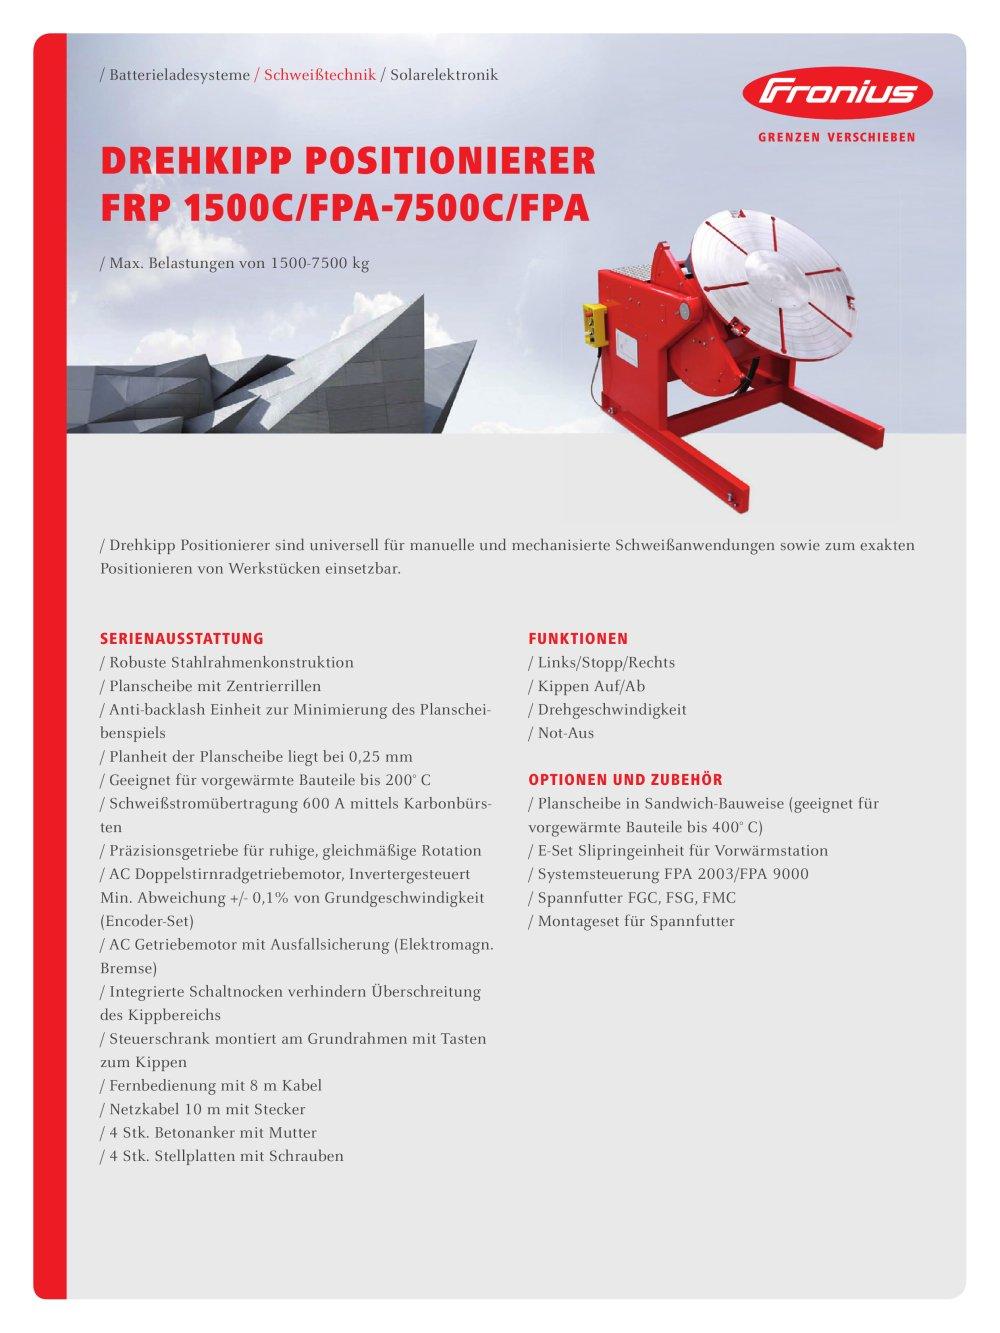 DREHKIPP POSITIONIERER FRP 1500C/FPA-7500C/FPA - FRONIUS - PDF ...